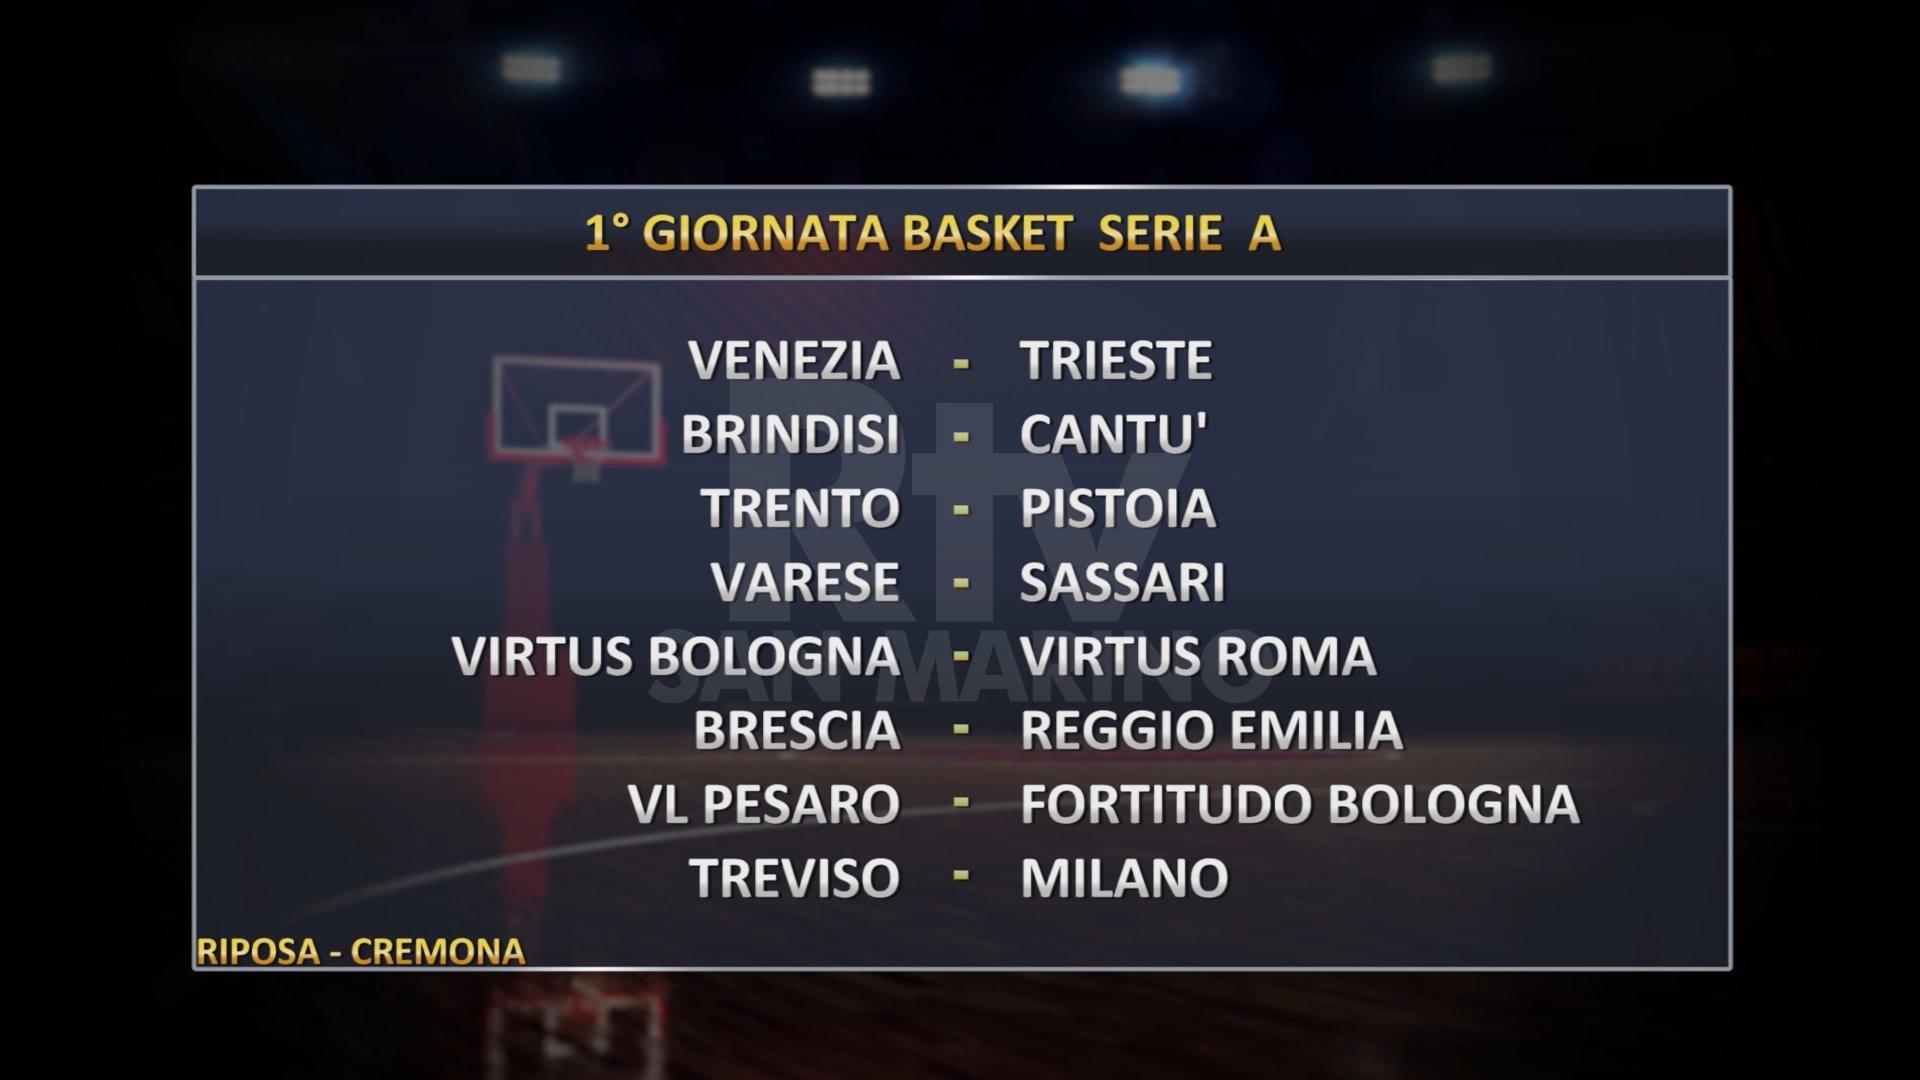 Virtus Roma Calendario.Serie A Basket Ecco I Calendari Apre Vl Pesaro Fortitudo